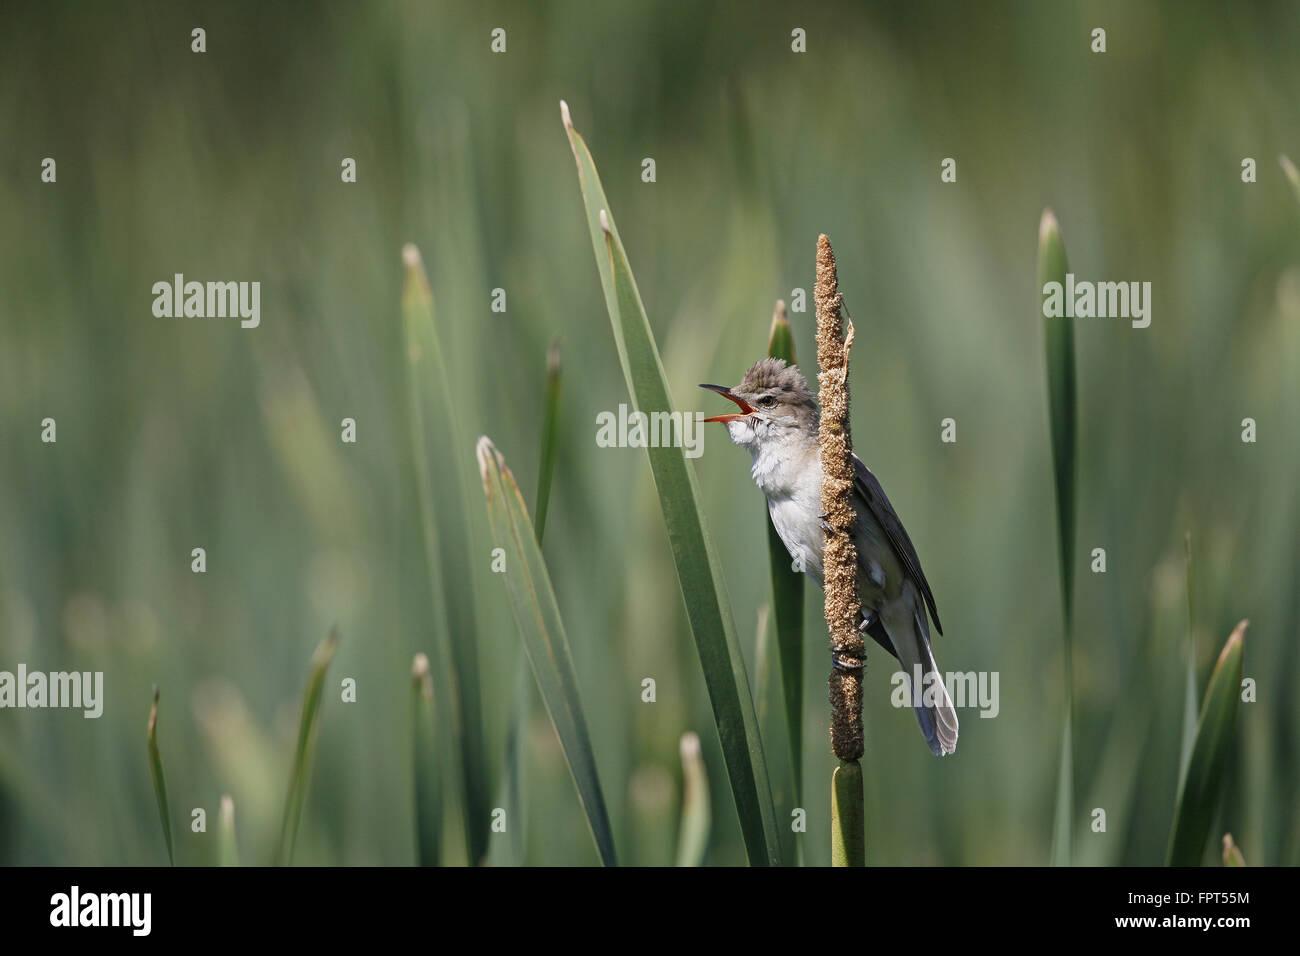 Great Reed Warbler, Acrocephalus arundinaceus, singing from reed bed Stock Photo